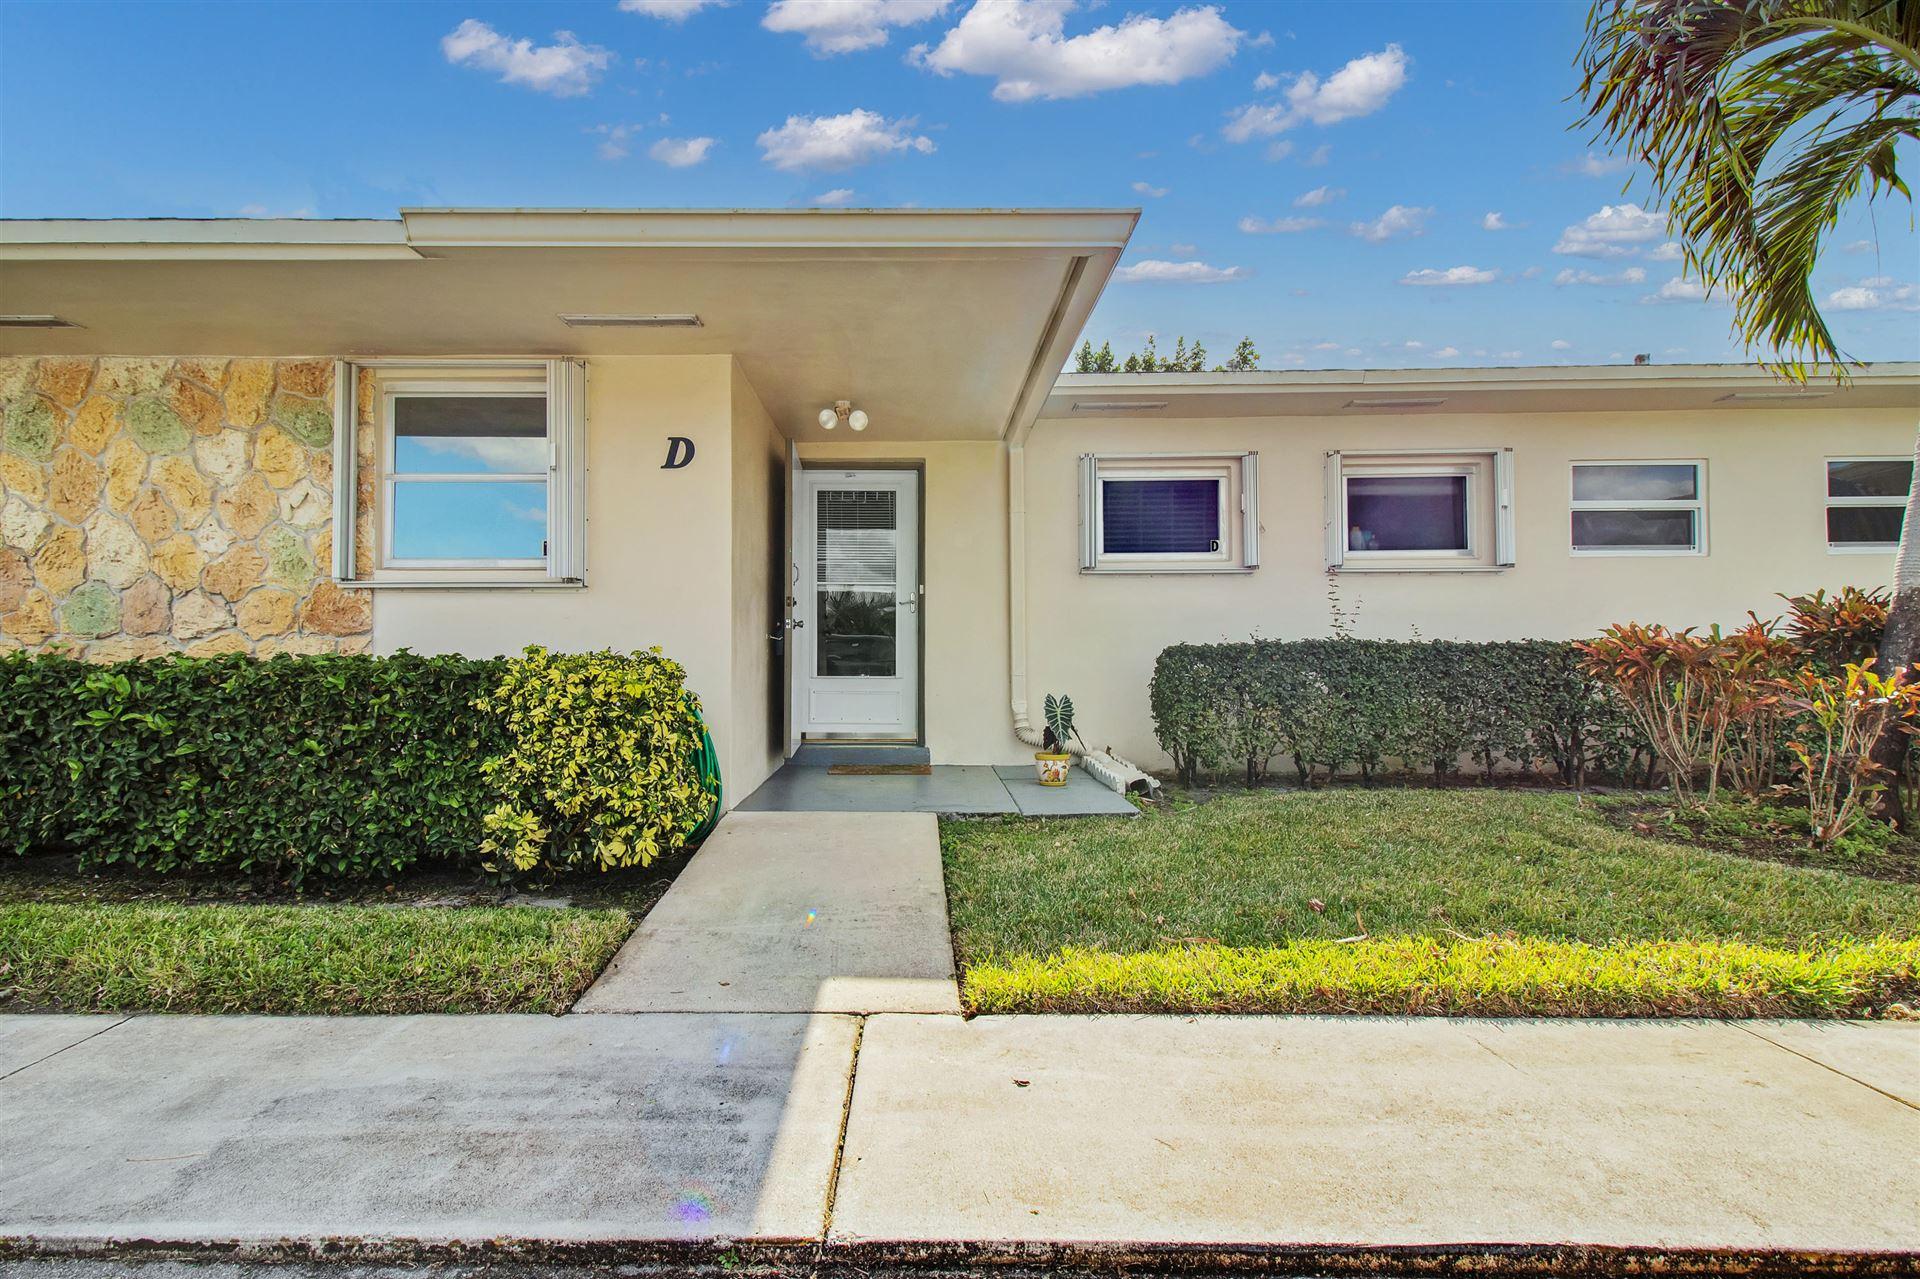 2737 Emory Drive E #D, West Palm Beach, FL 33415 - #: RX-10724897